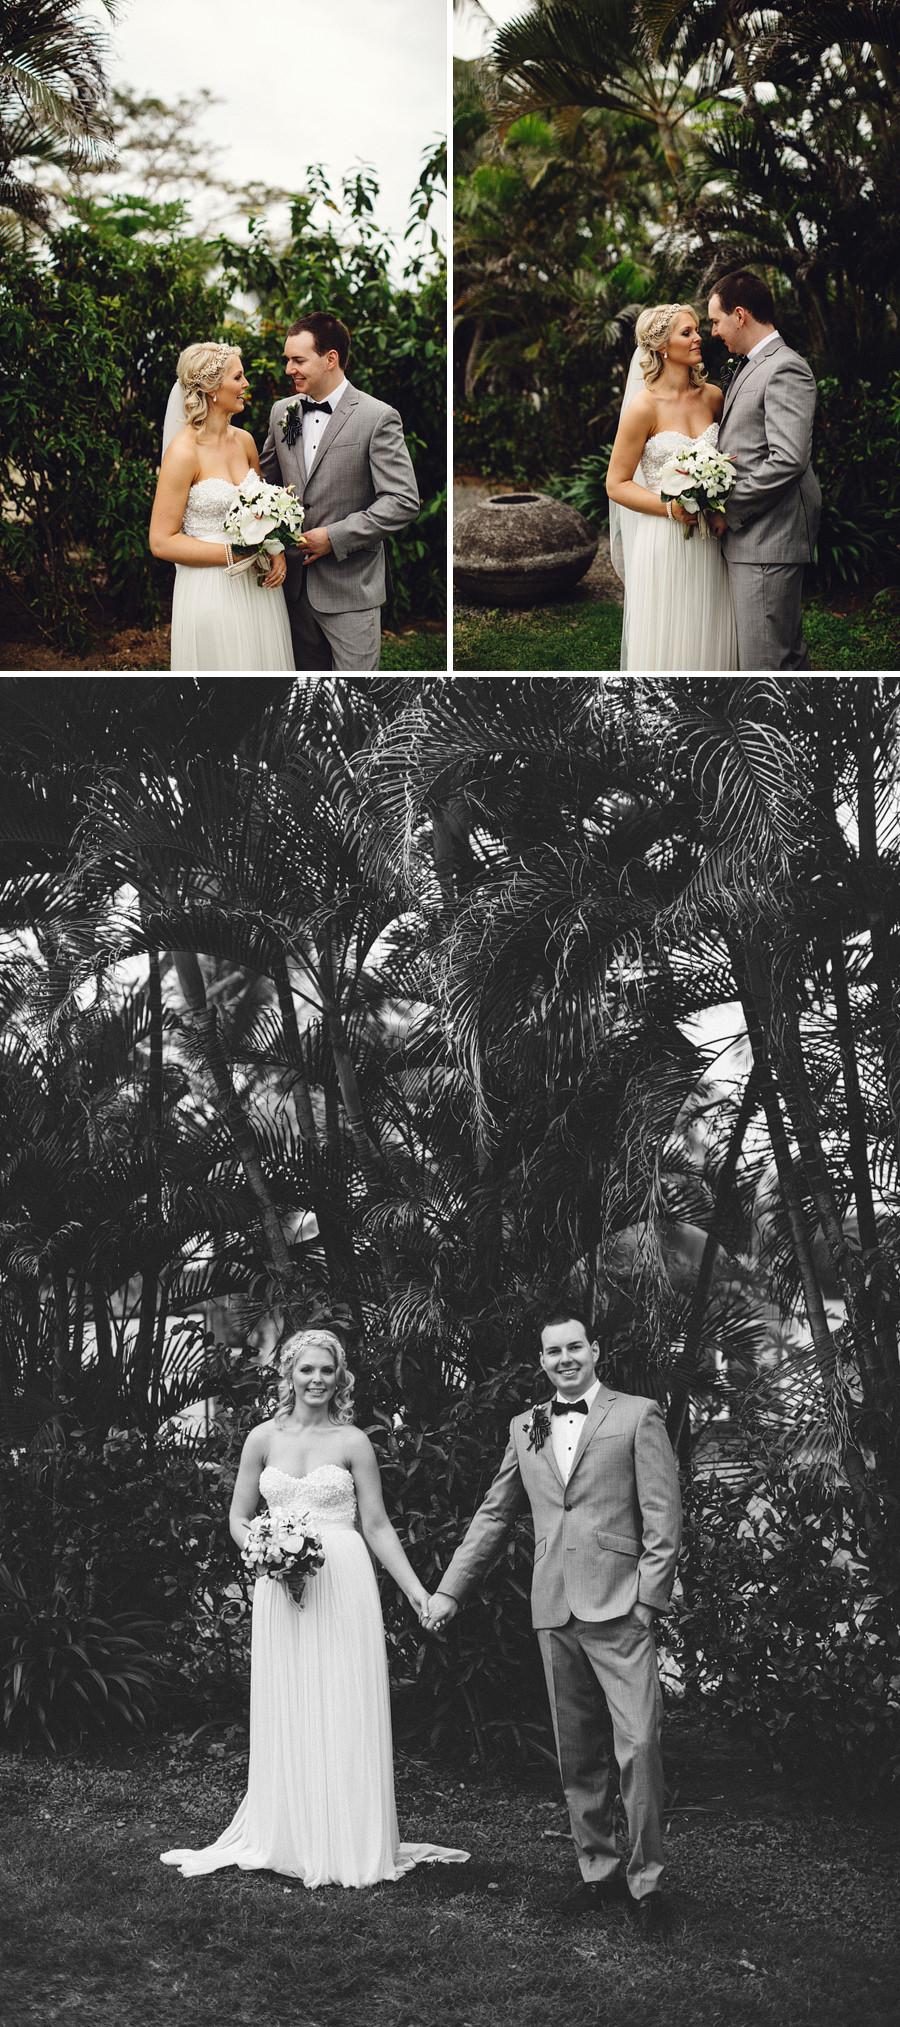 Hilton Fiji Wedding Photographer: Bride & Groom portraits